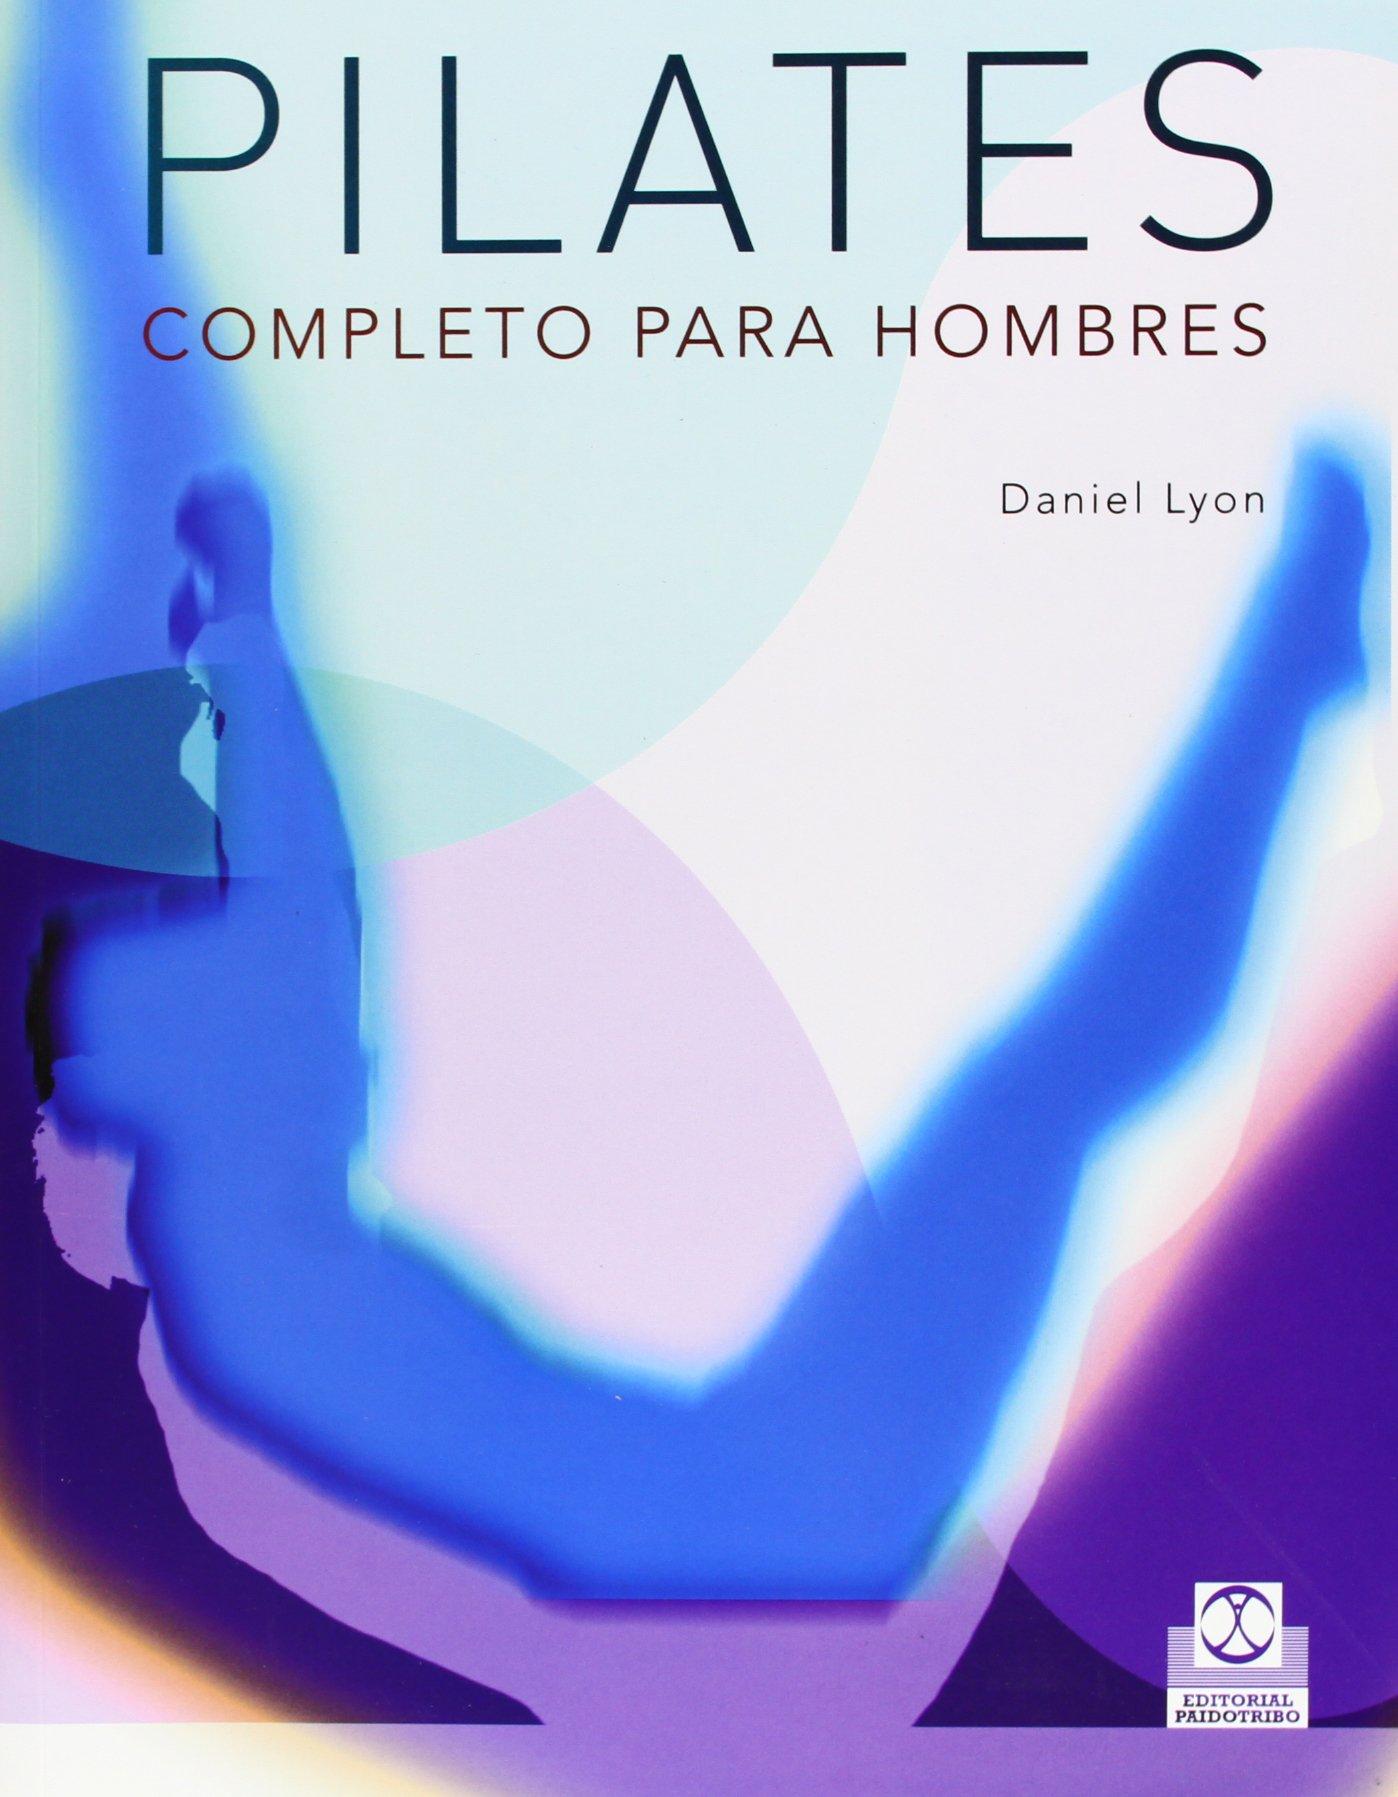 Pilates completo para hombres (Spanish Edition): Daniel Lyon ...